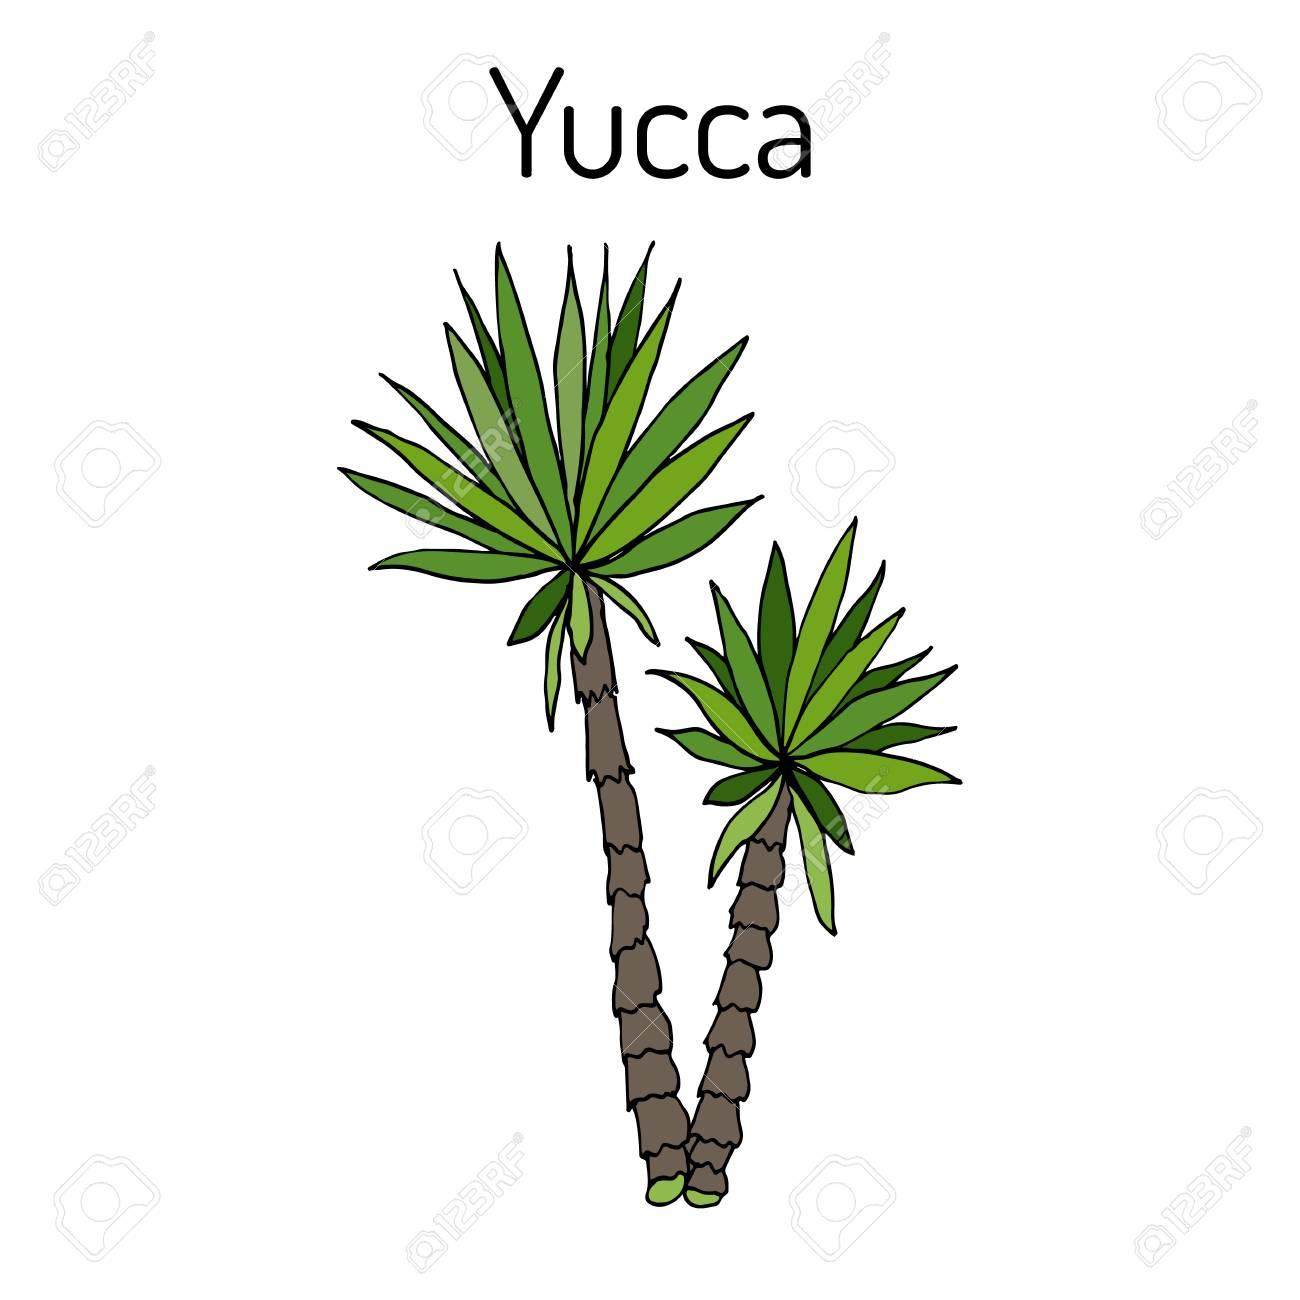 Yucca gloriosa medicinal plant illustration. - 89022654